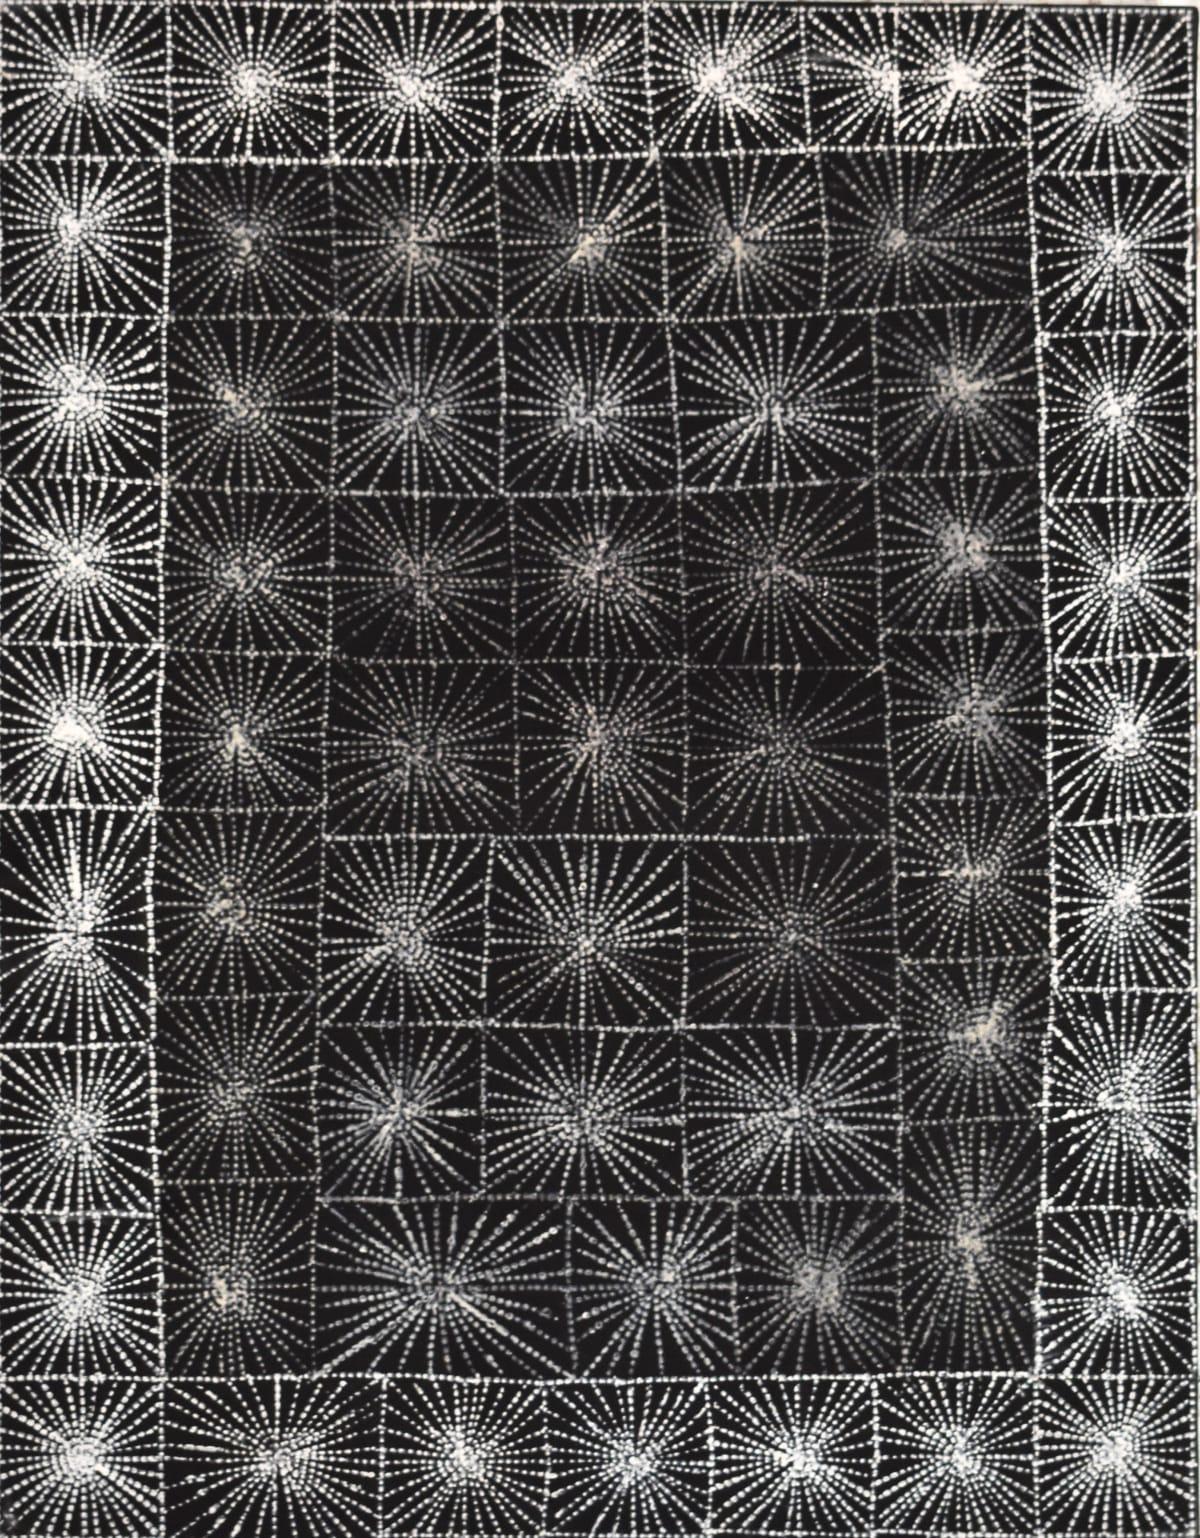 Raylene Miller Japalinga natural ochres on canvas 90 x 70 cm